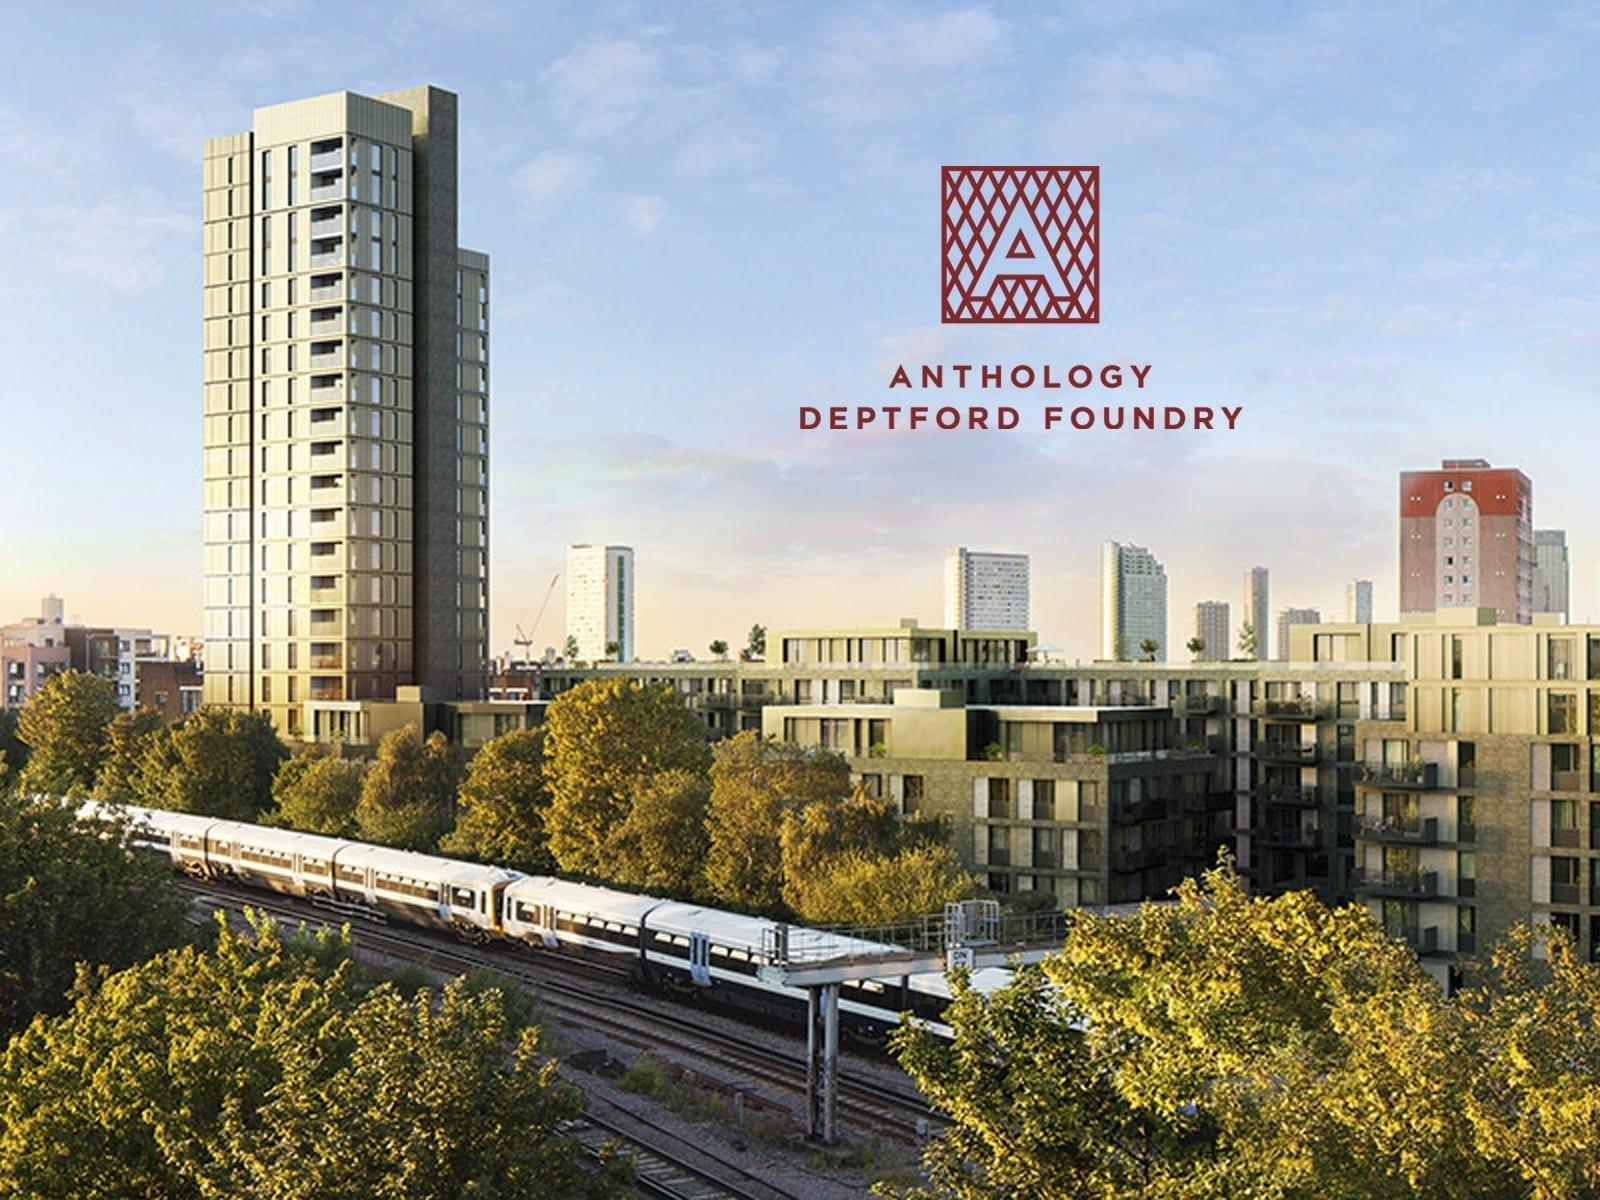 Deptford Foundry